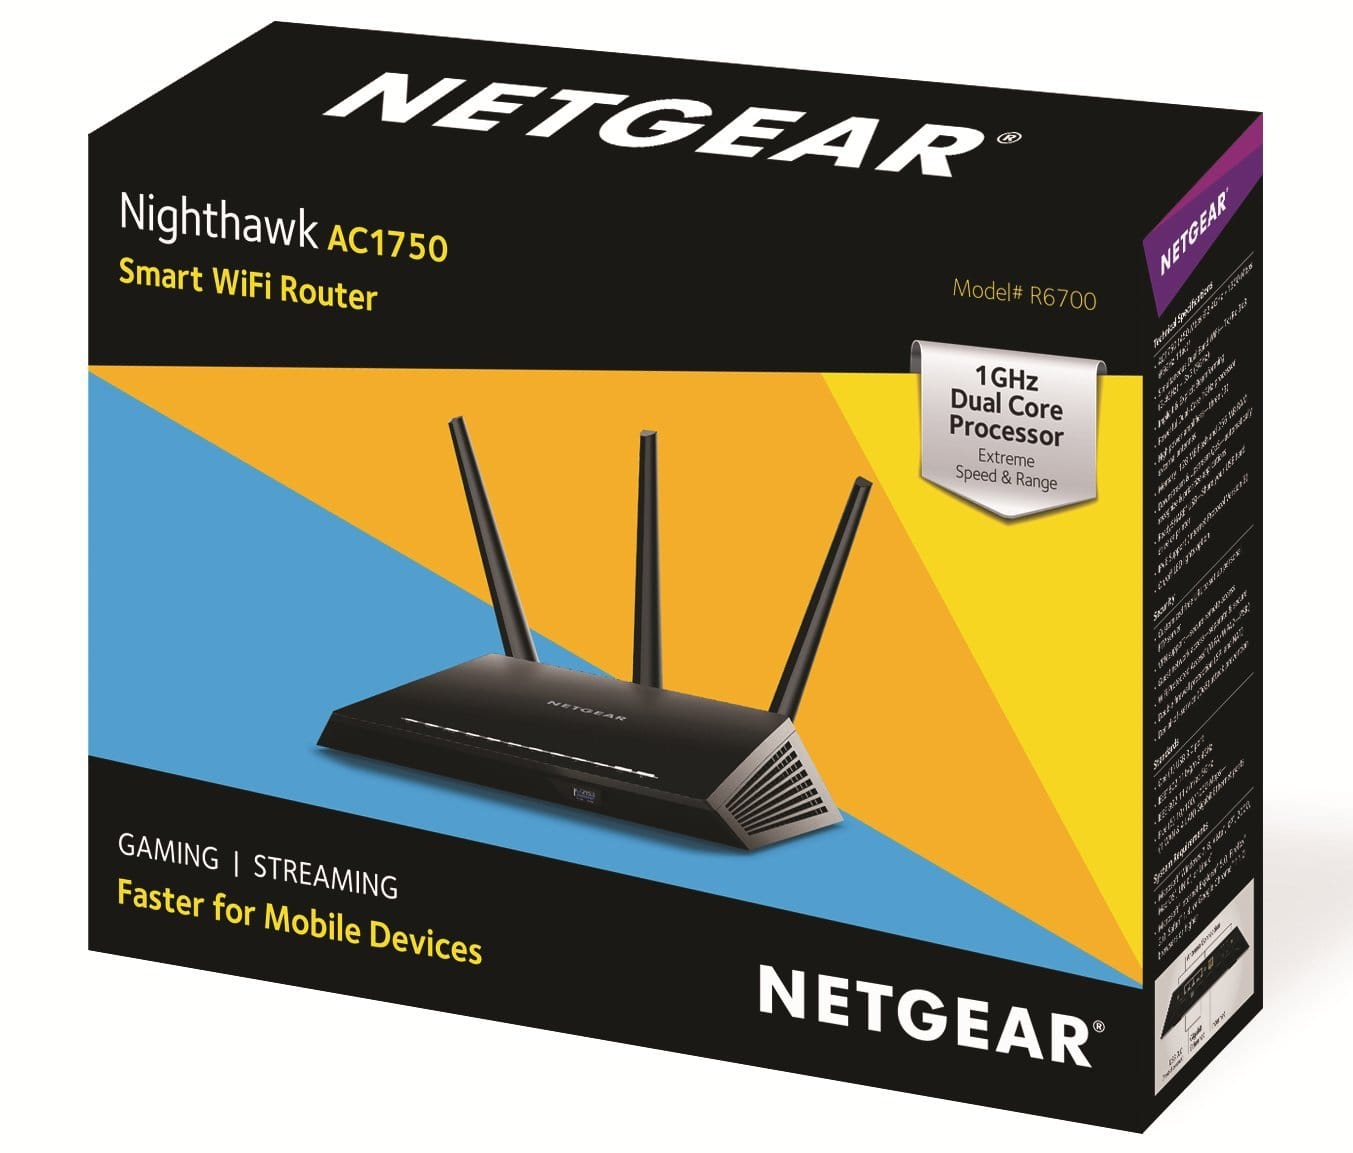 NETGEAR Nighthawk AC1750 Smart Dual Band WiFi Router (R6700)($52)(Amazon)